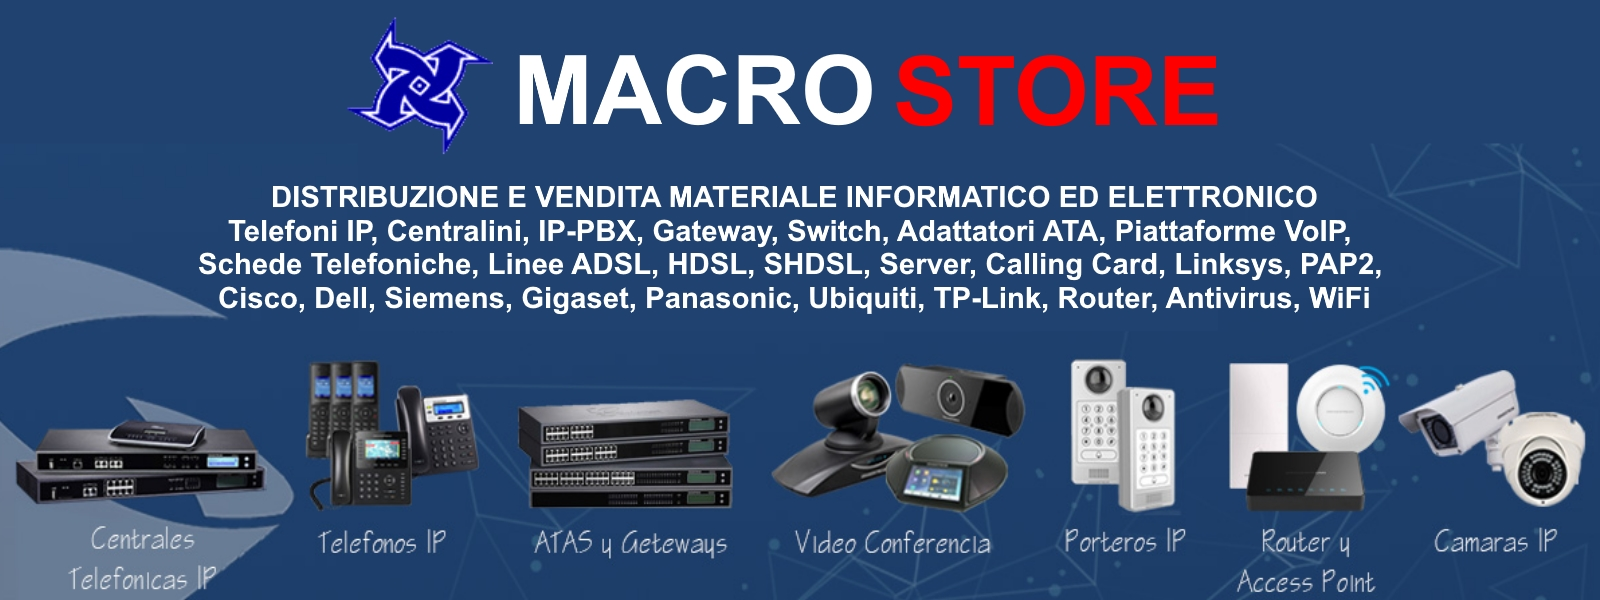 macrostore1